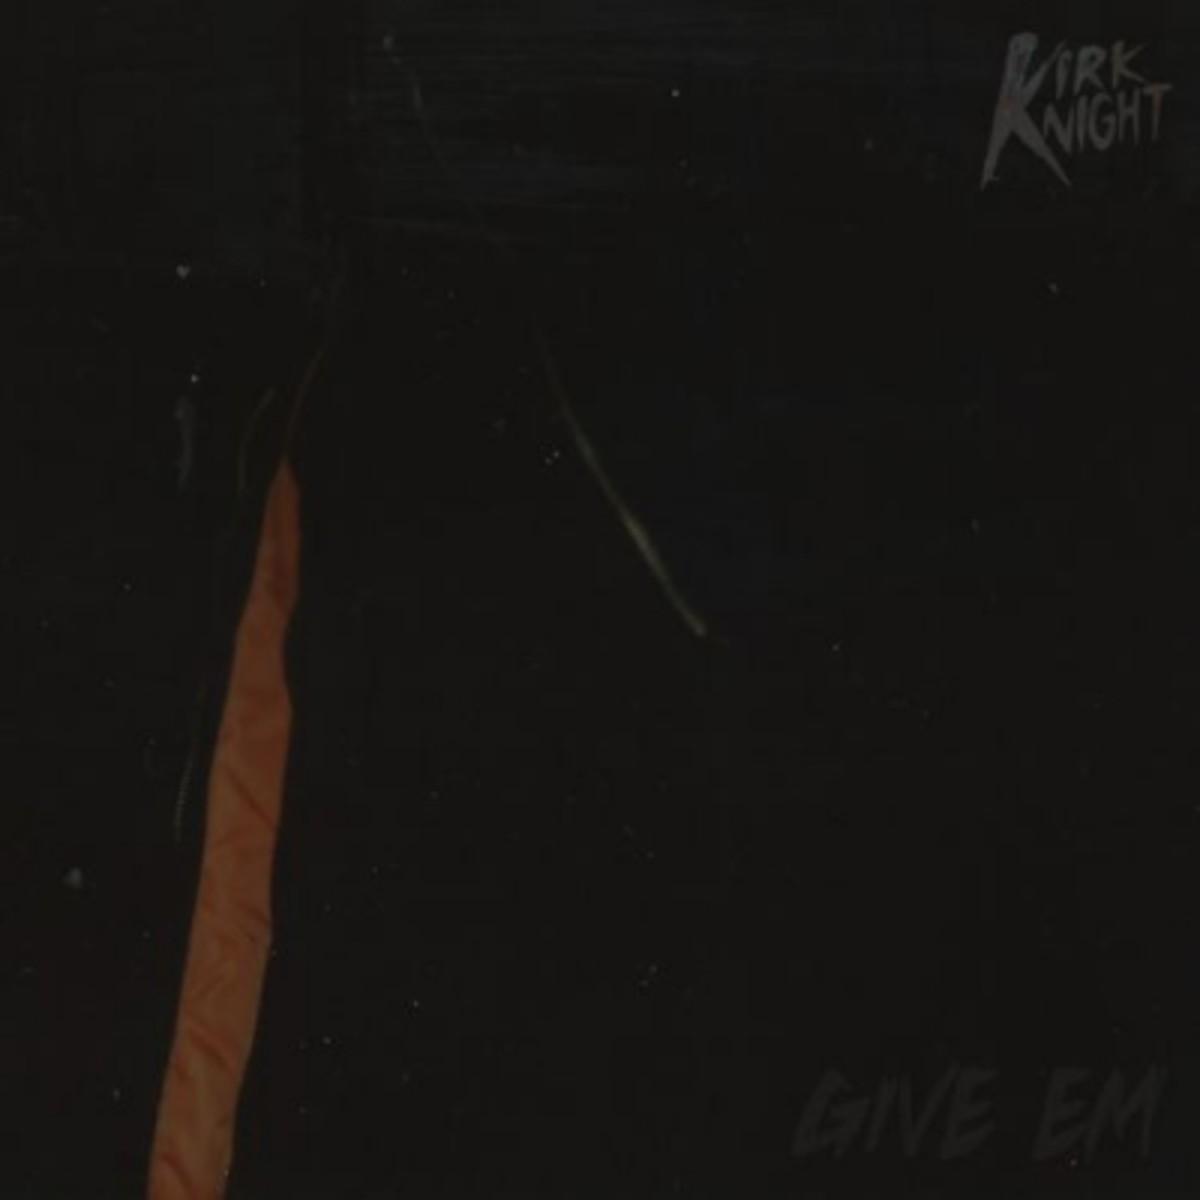 kirk-knight-give-em.jpg